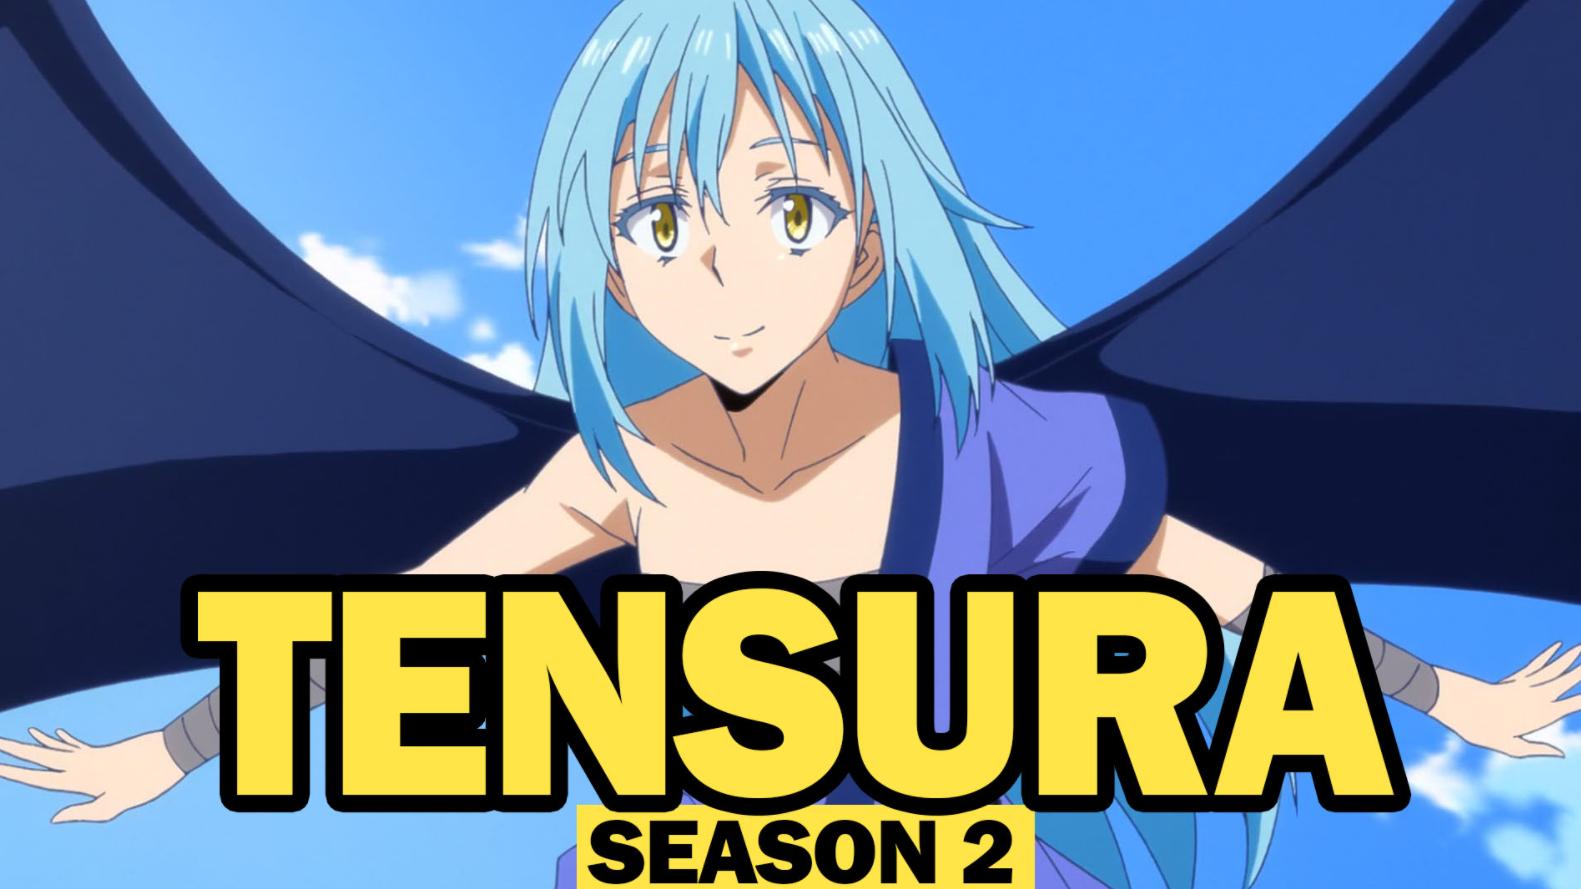 tensura season 2 part 2 episode 7